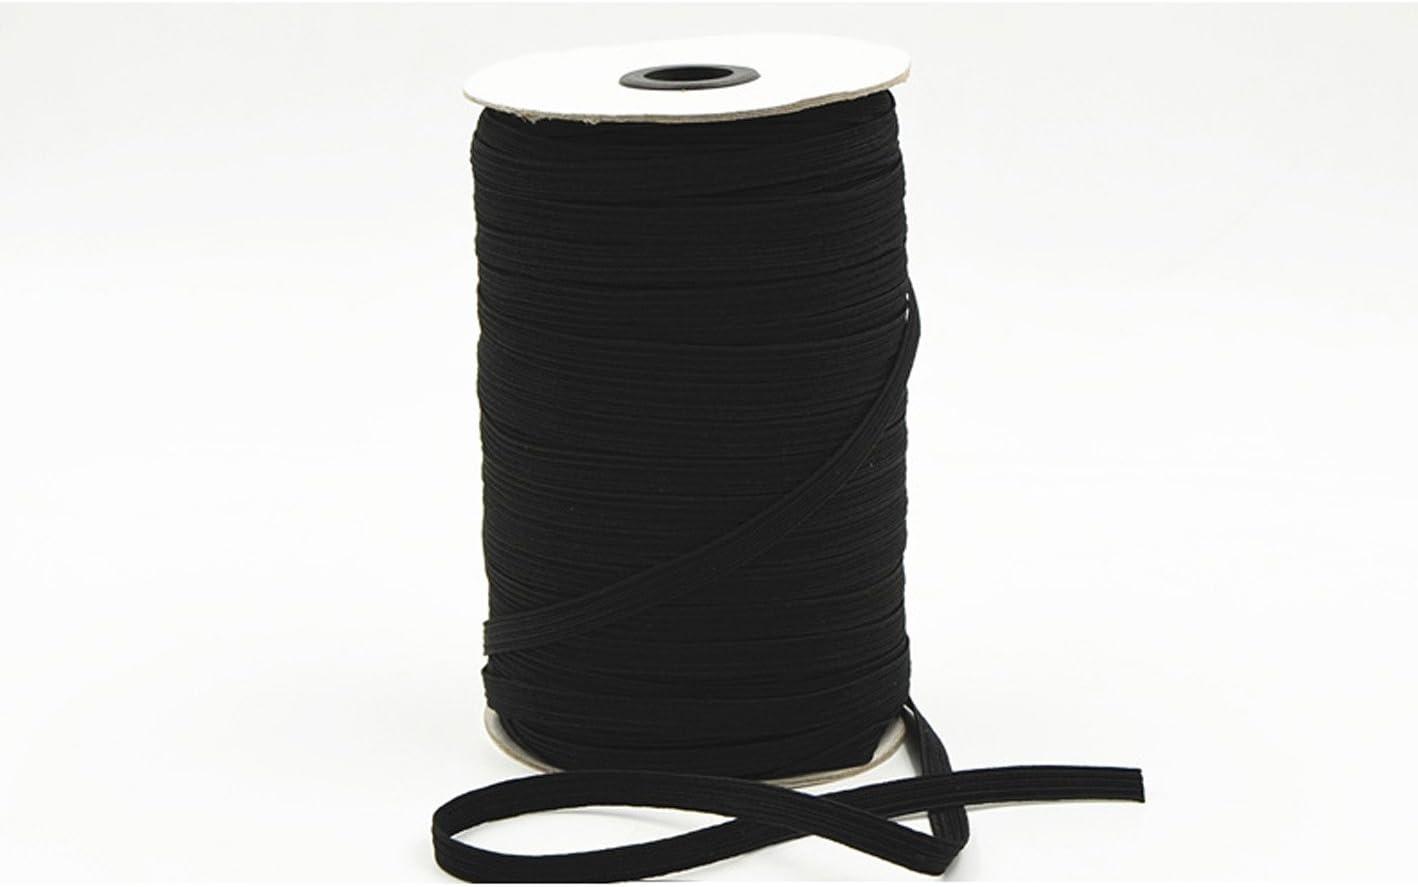 Greenpromise - Cinta elástica ancha para coser 10mm x 90Meters ...